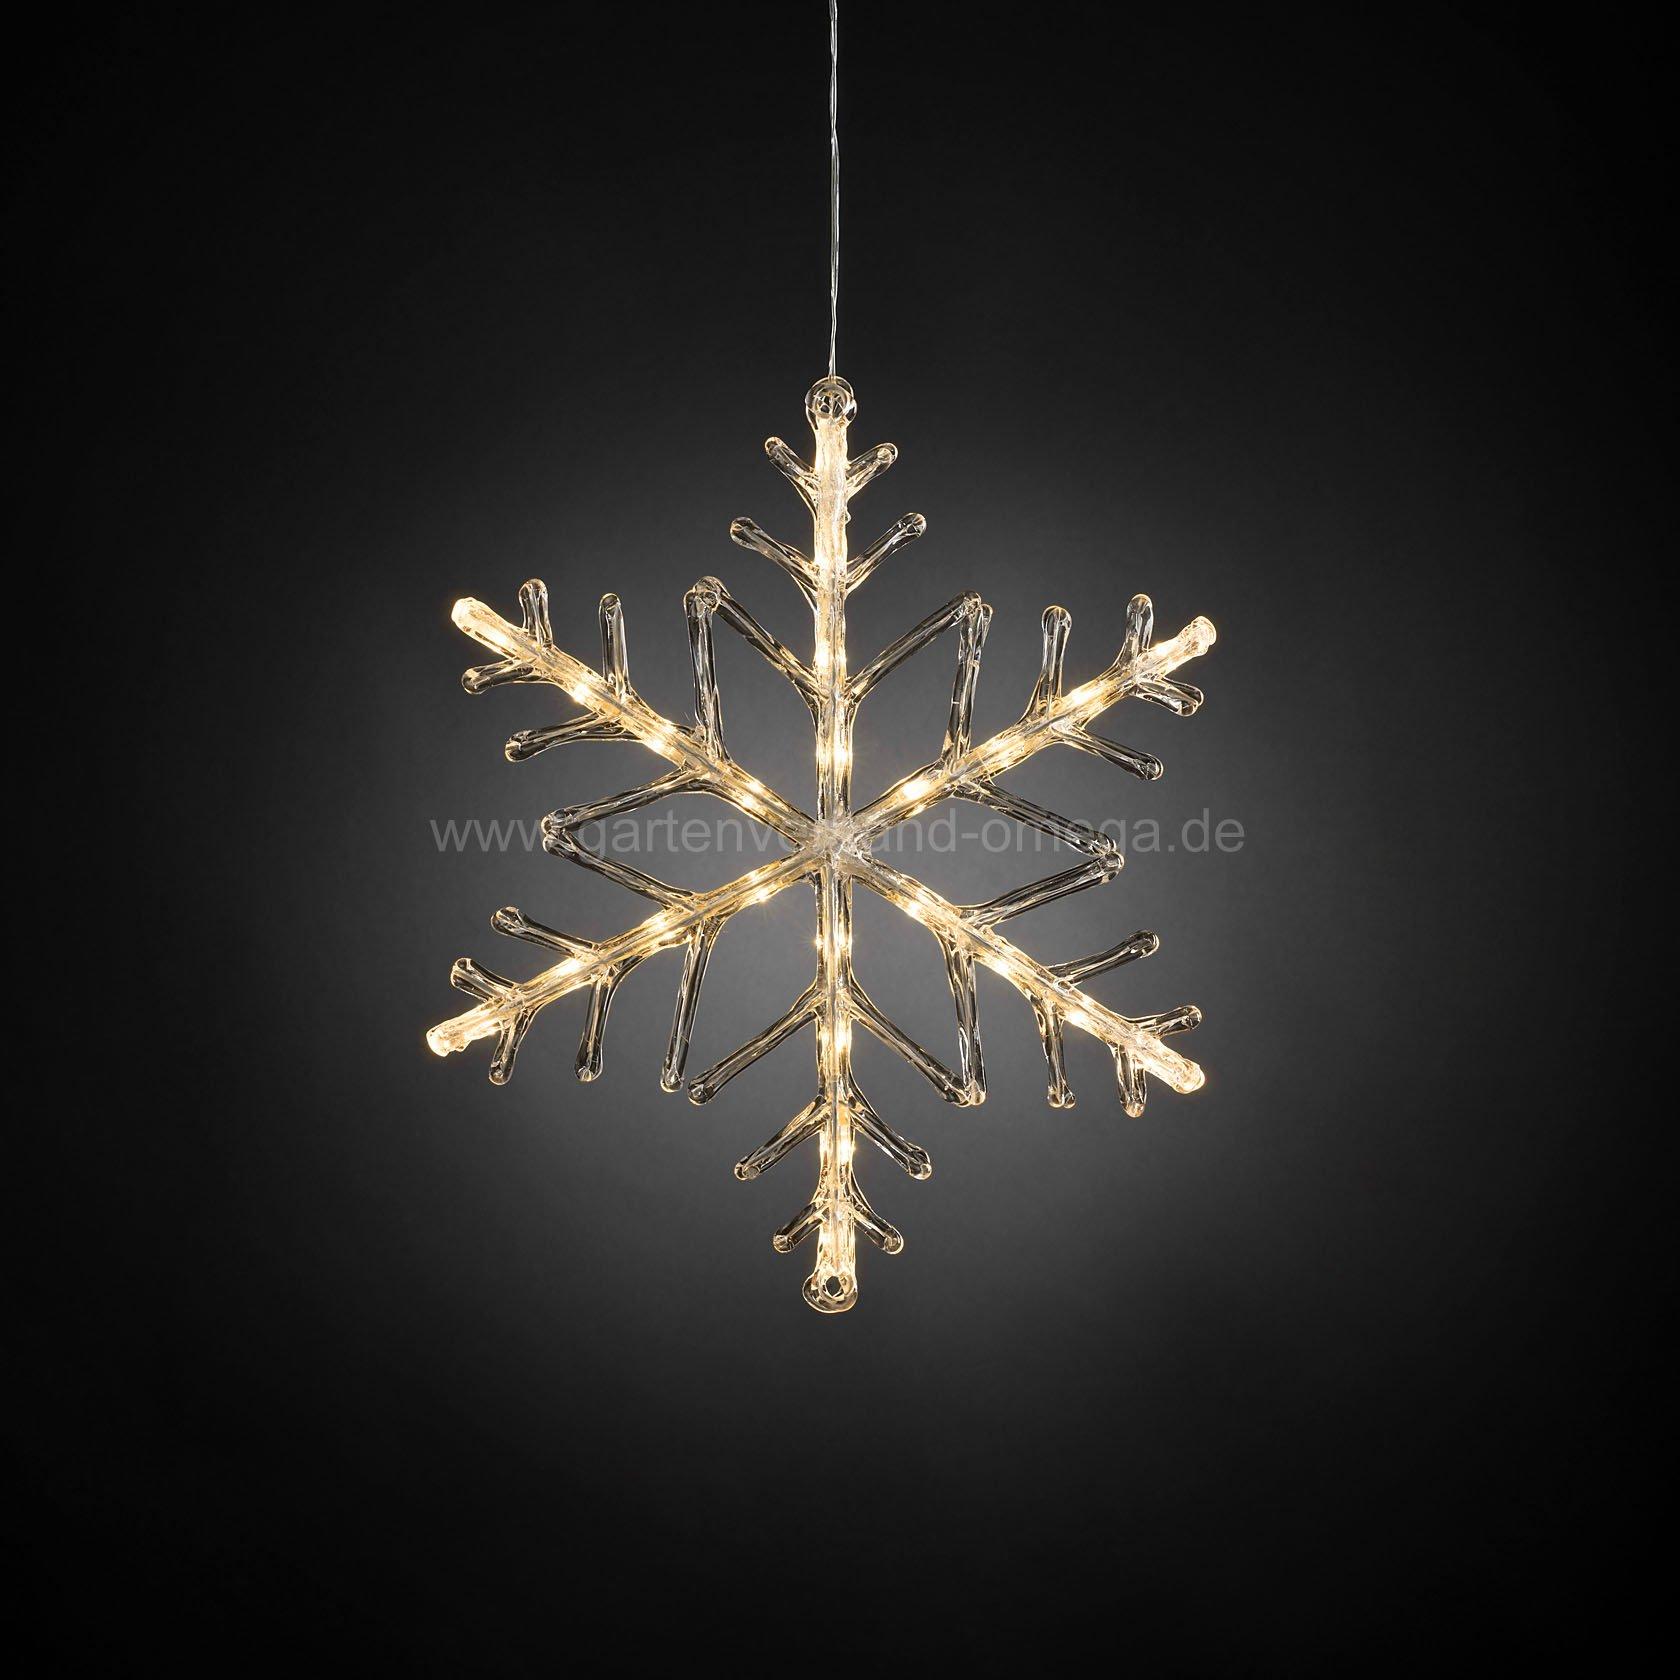 batteriebetriebene led acryl schneeflocke acrylsilhouette weihnachtsbeleuchtung im garten. Black Bedroom Furniture Sets. Home Design Ideas